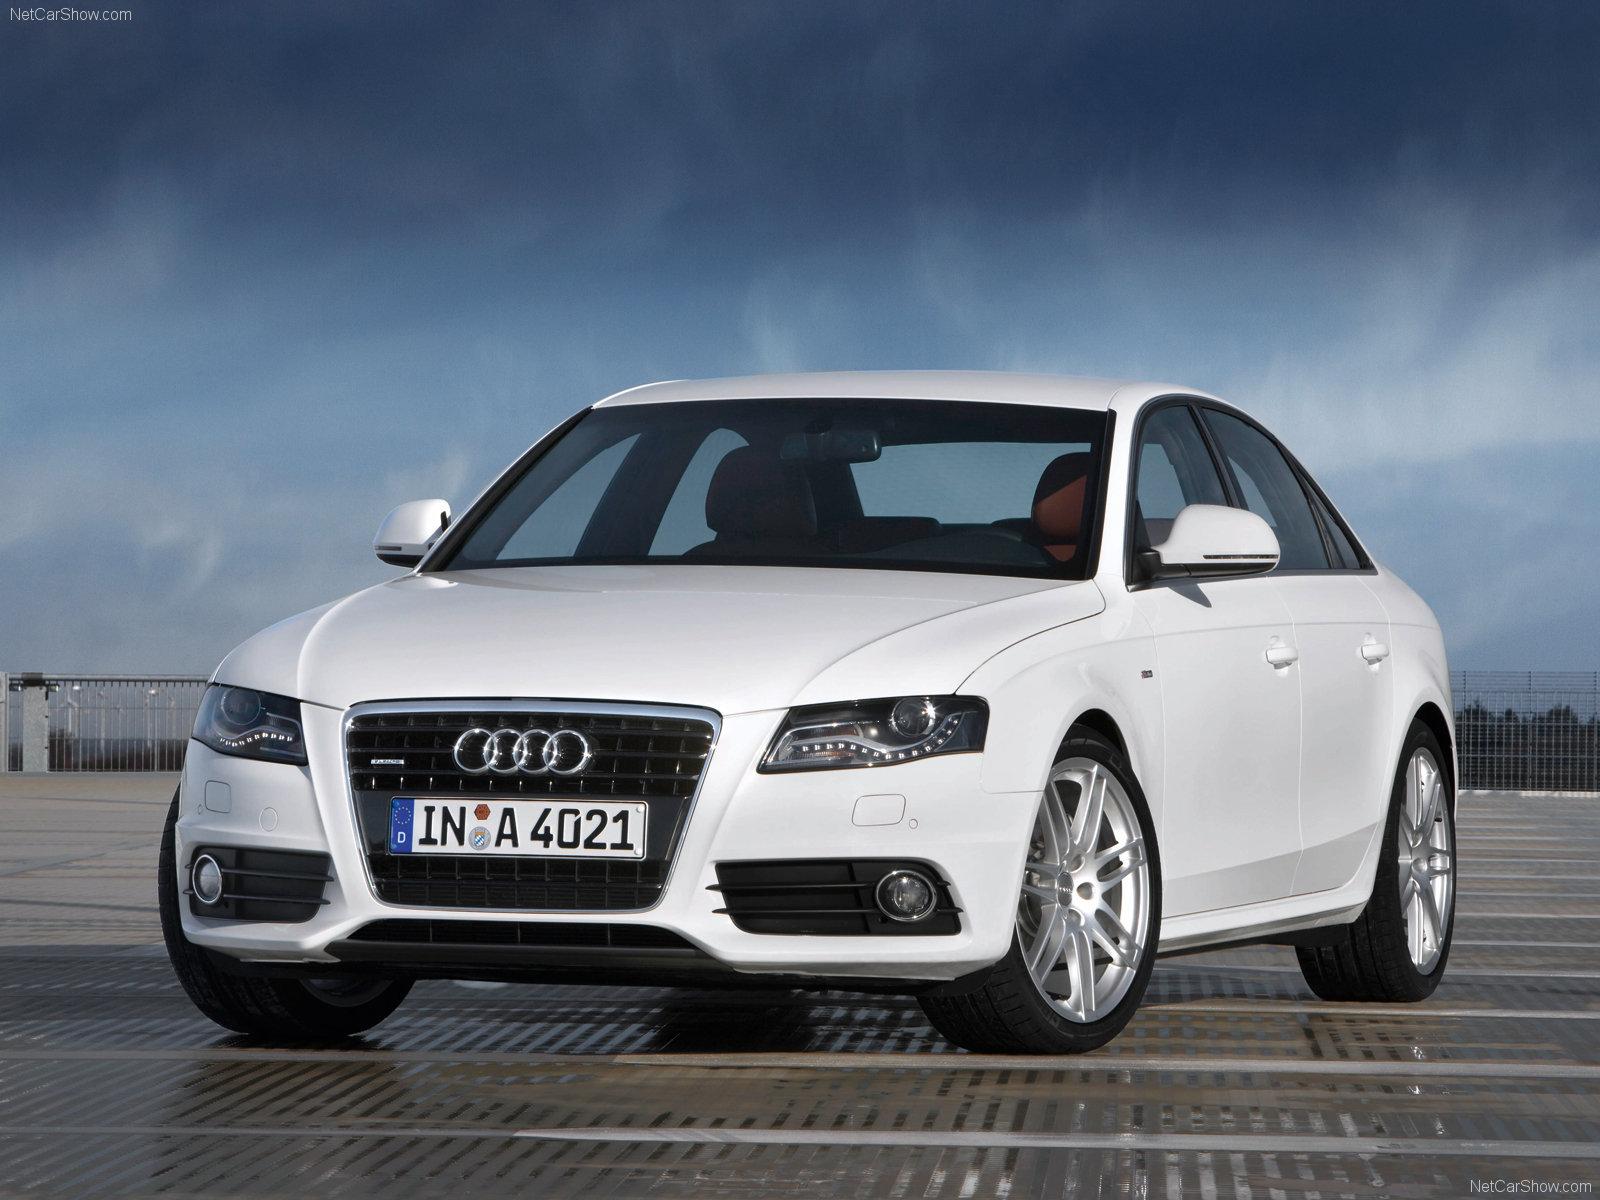 Audi-A4_2009_1600x1200_wallpaper_03%5B1%